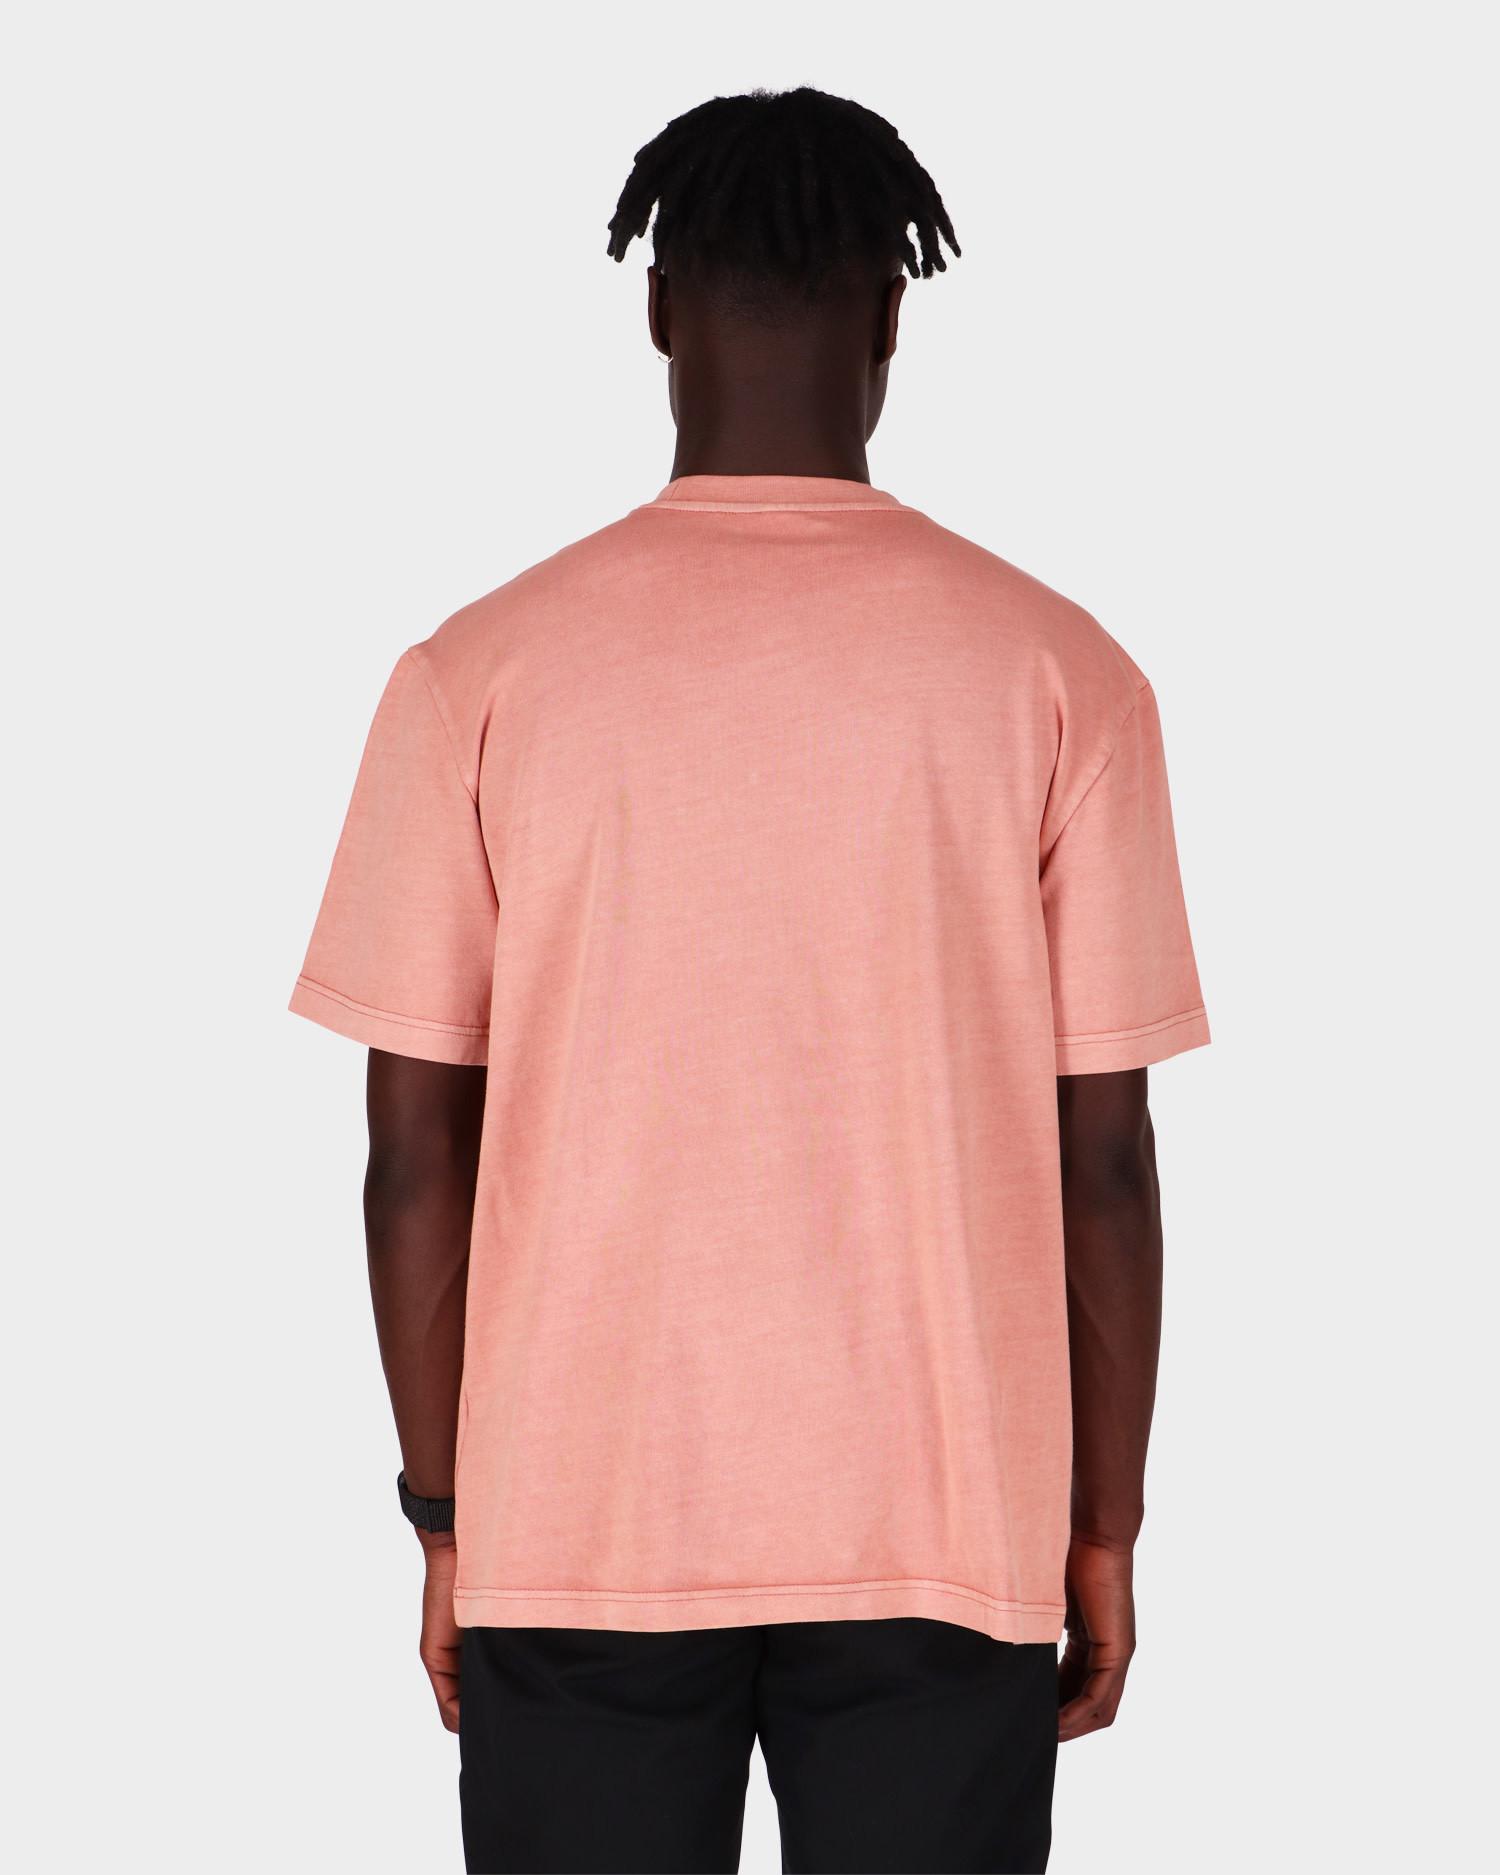 Reebok Classics Natural Dye T-Shirt Baked Earth